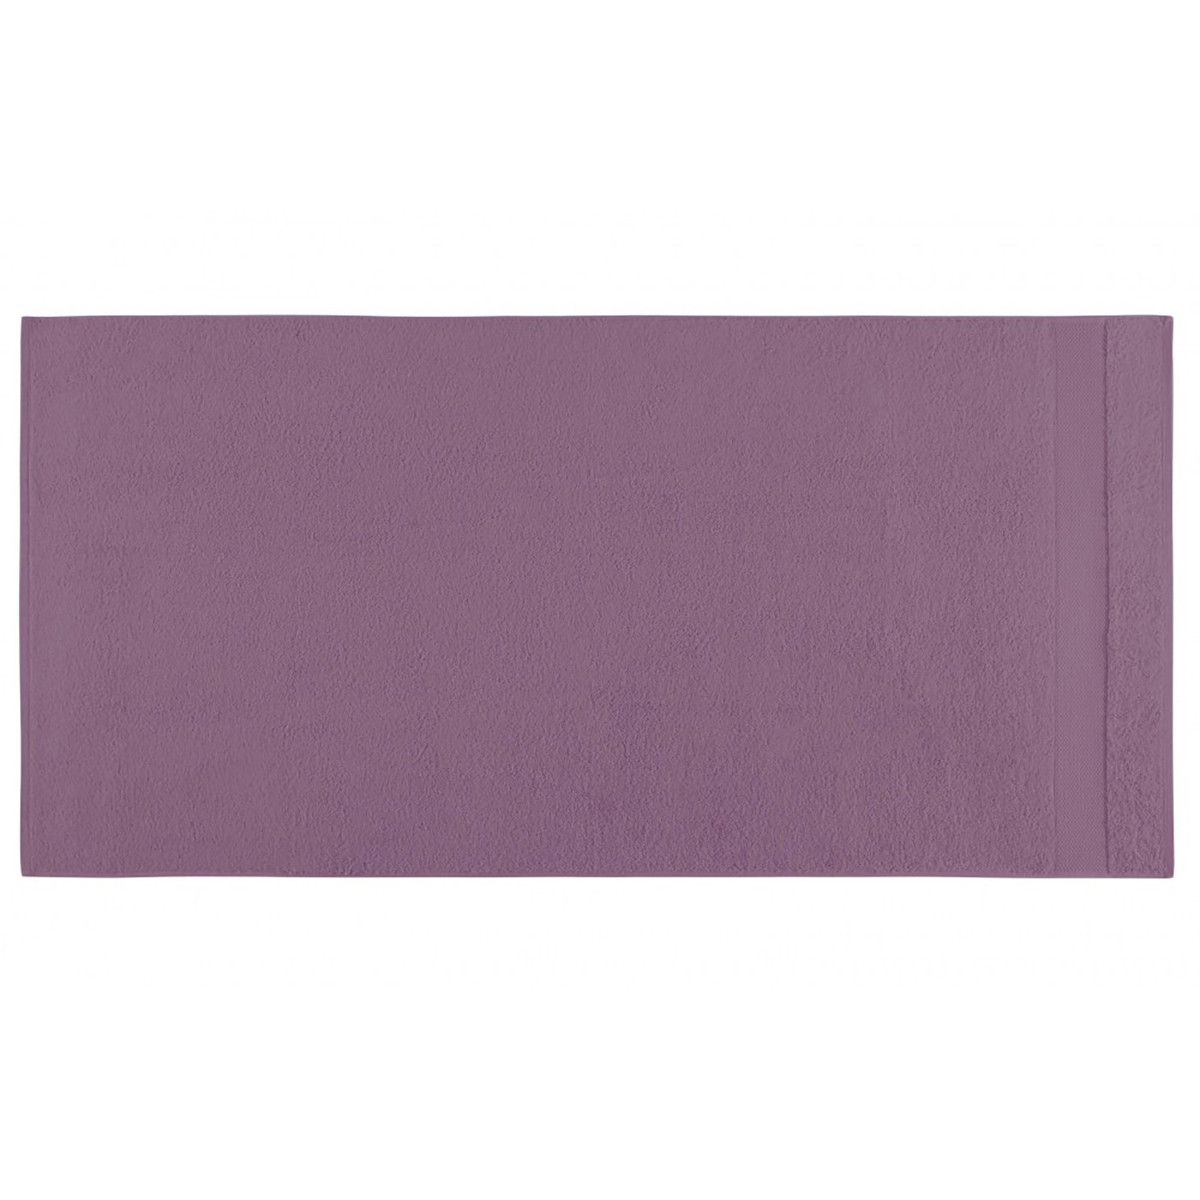 Drap de douche coton 70x140 cm hortensia